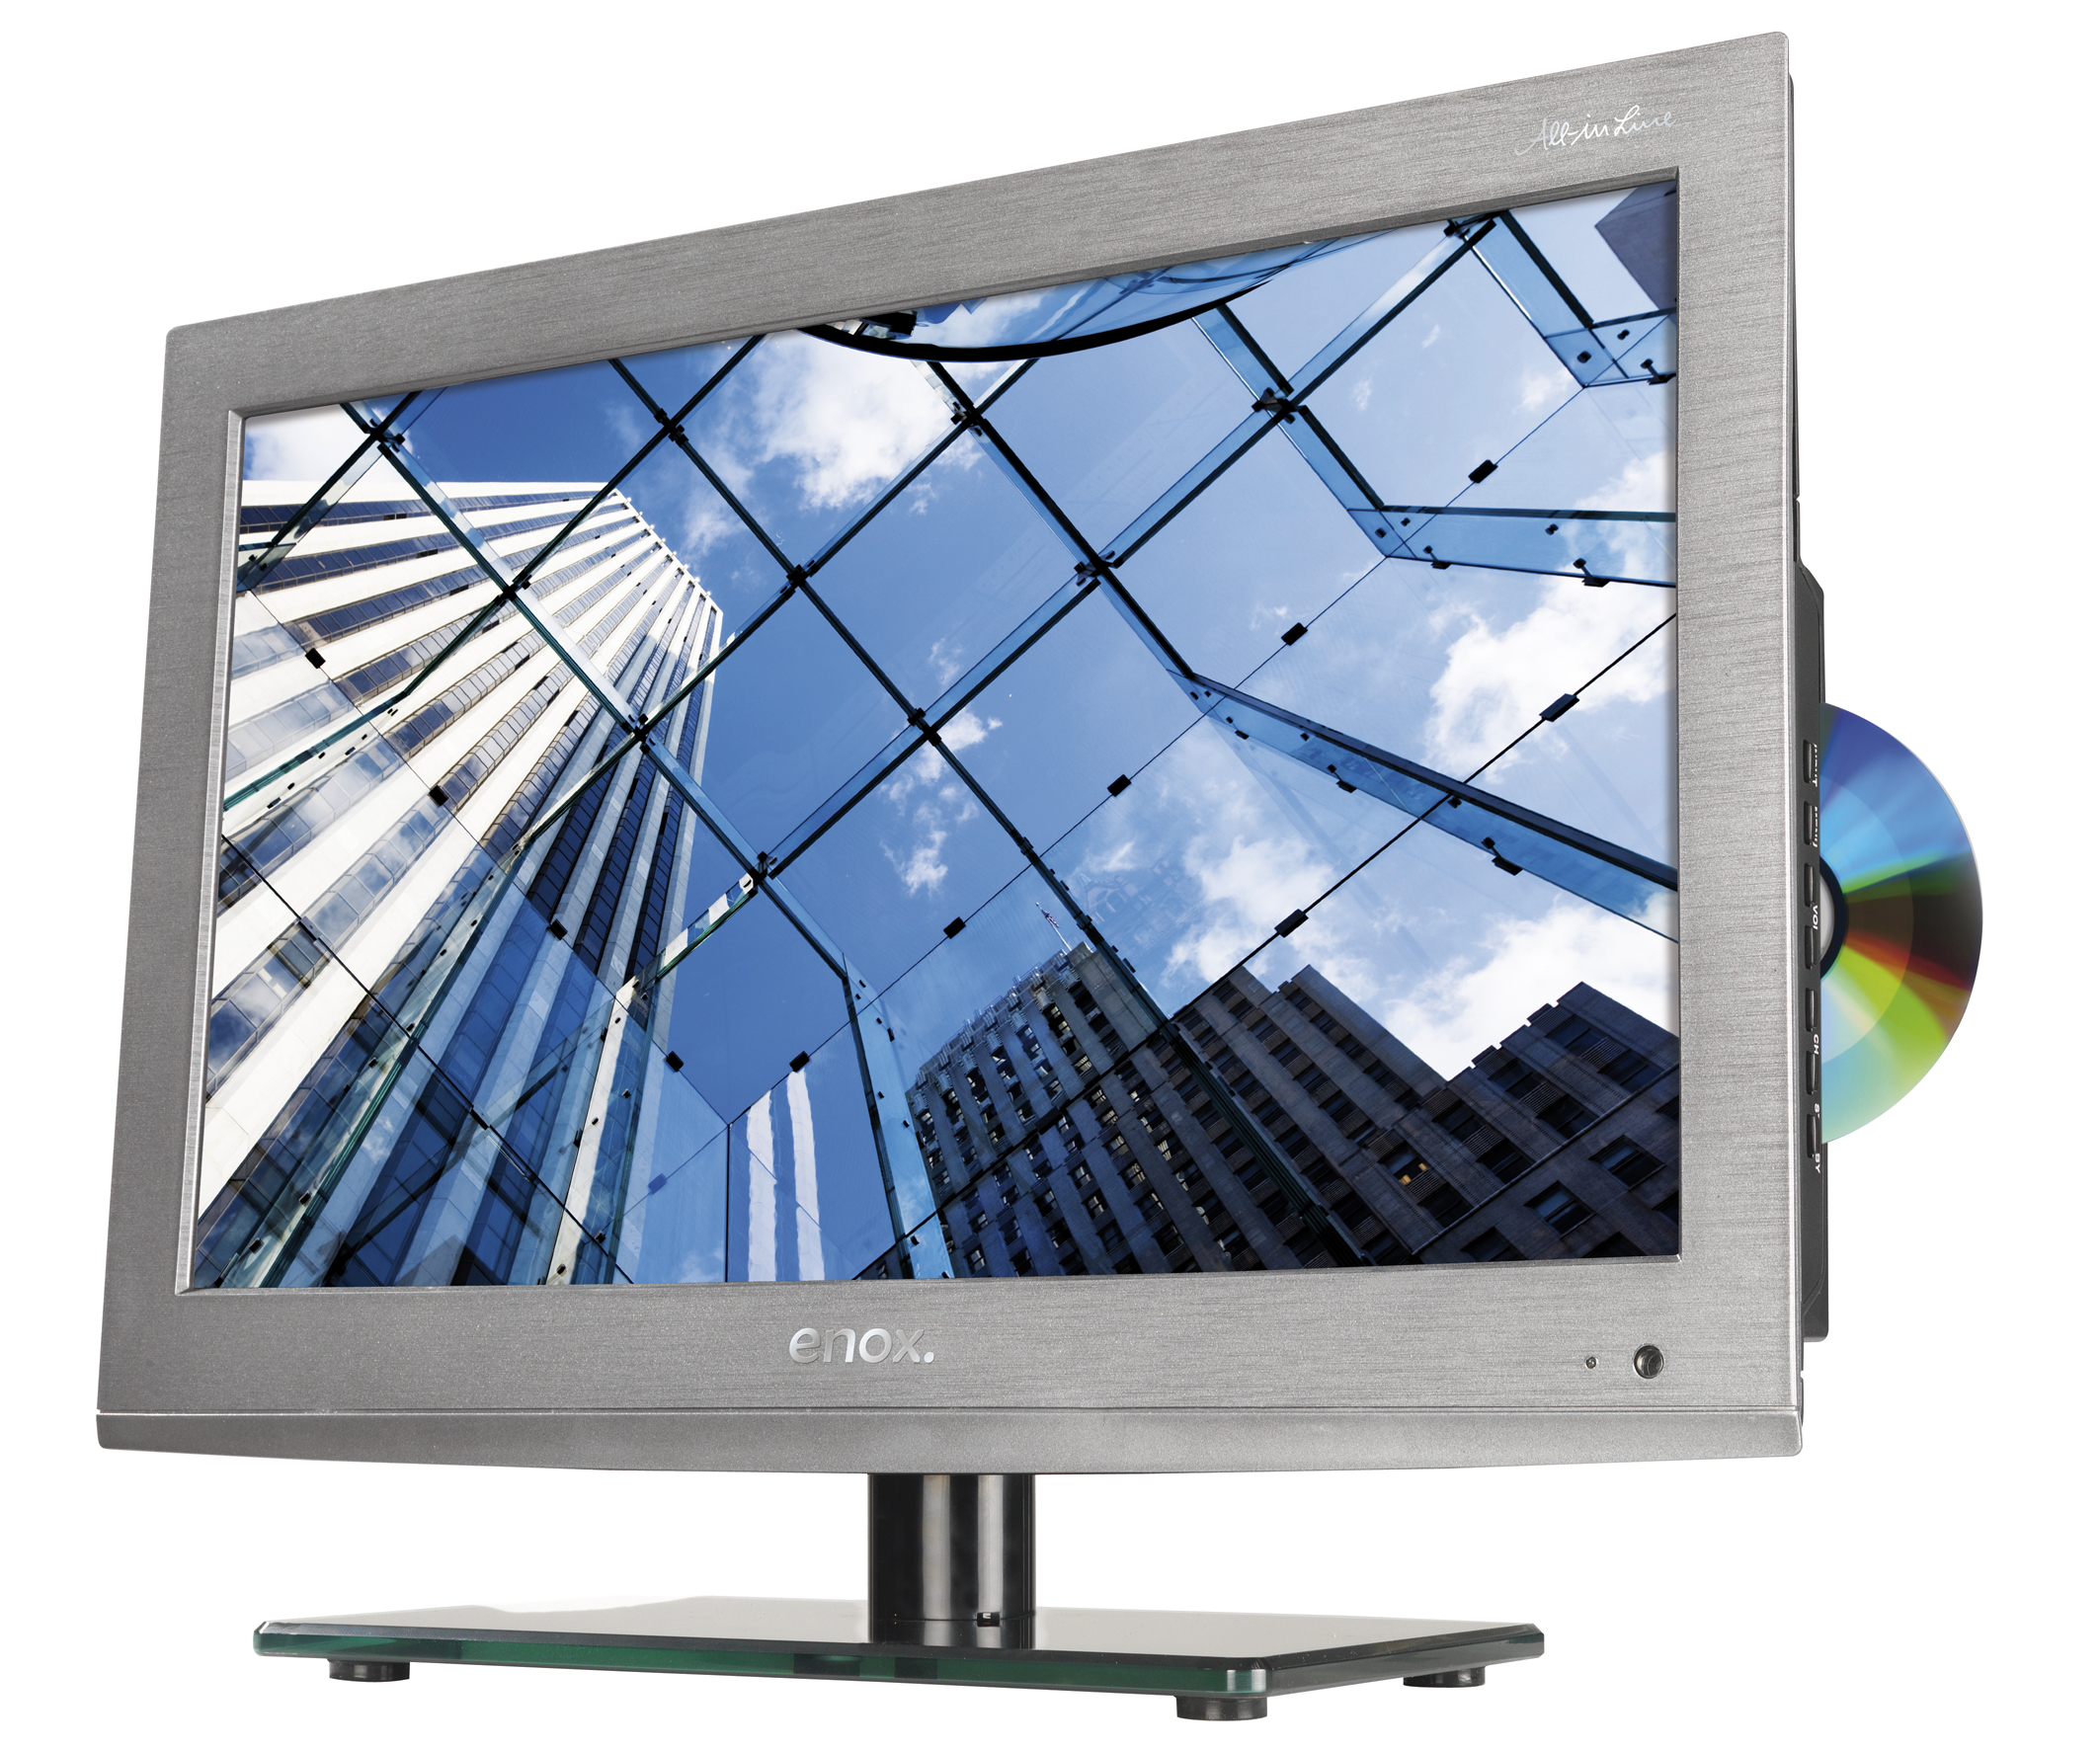 enox 19 zoll LED TV AIL-2519S2DVD mit DVB-S2 für 12V